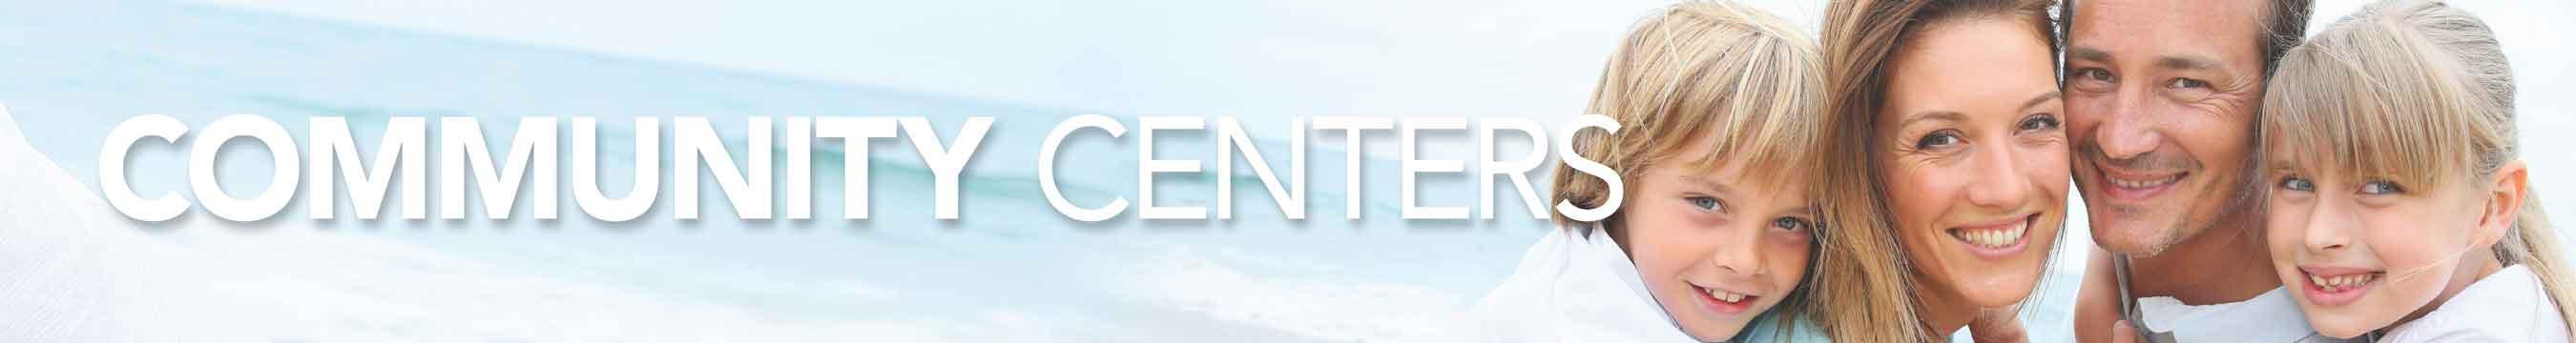 Active-Wellness-Community-Centers.jpg